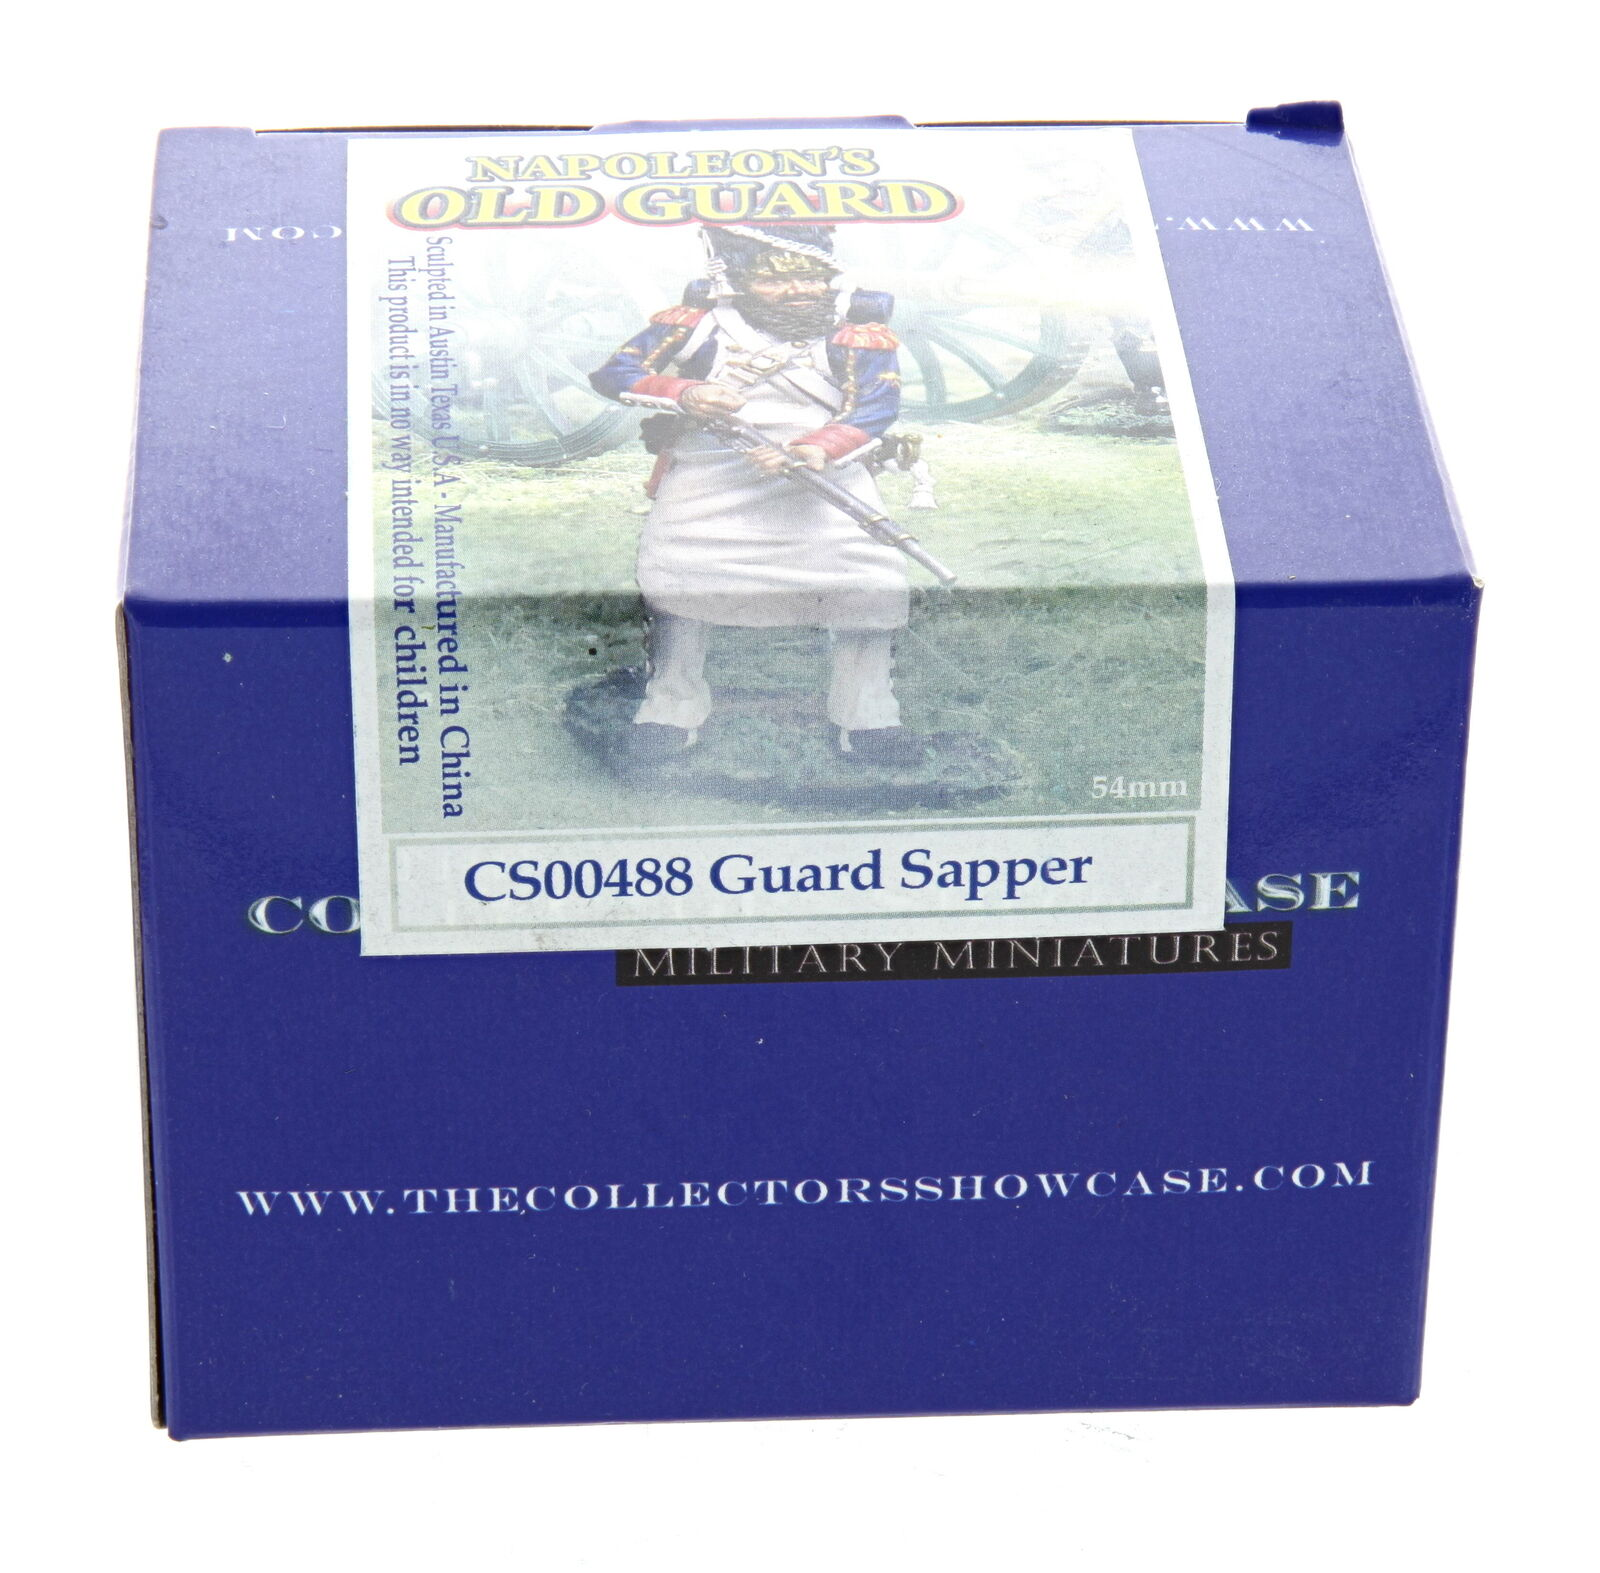 Collectors Showcase Guard Sapper CS00488 - Napoleon's Napoleon's Napoleon's Old Guard Collection 2bb8bd